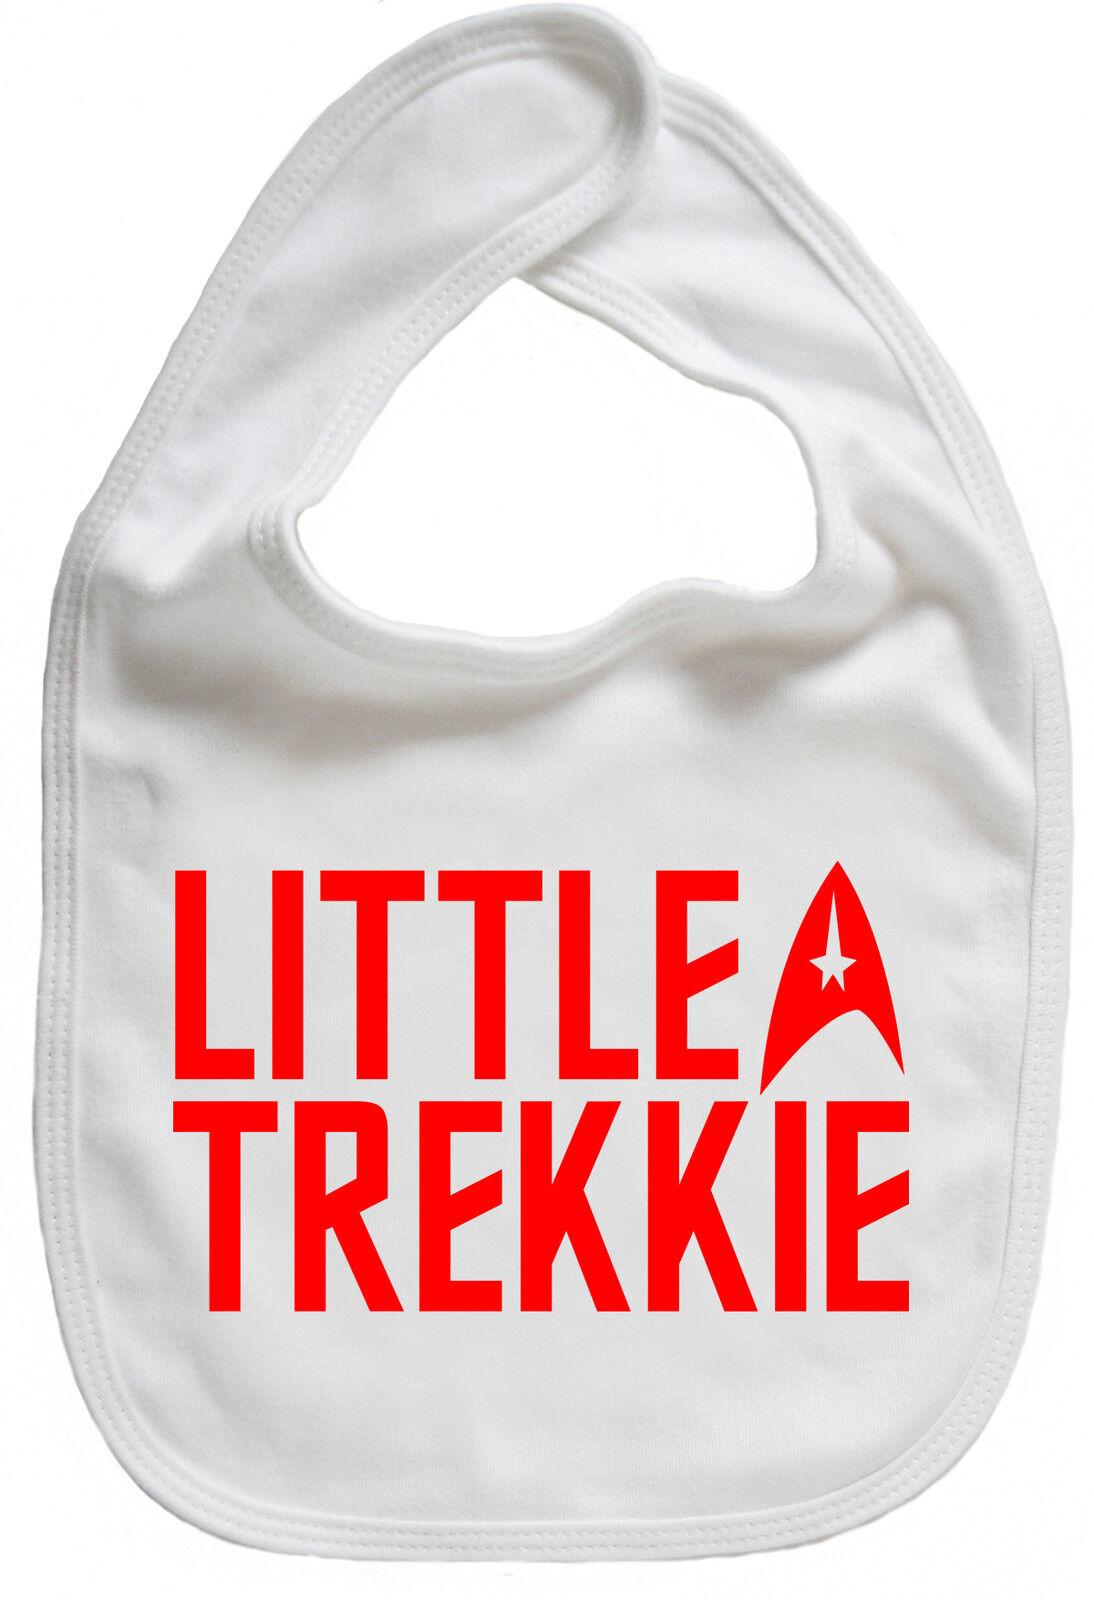 Star Trek Little Trekkie Barboteuse B/éb/é gar/çon